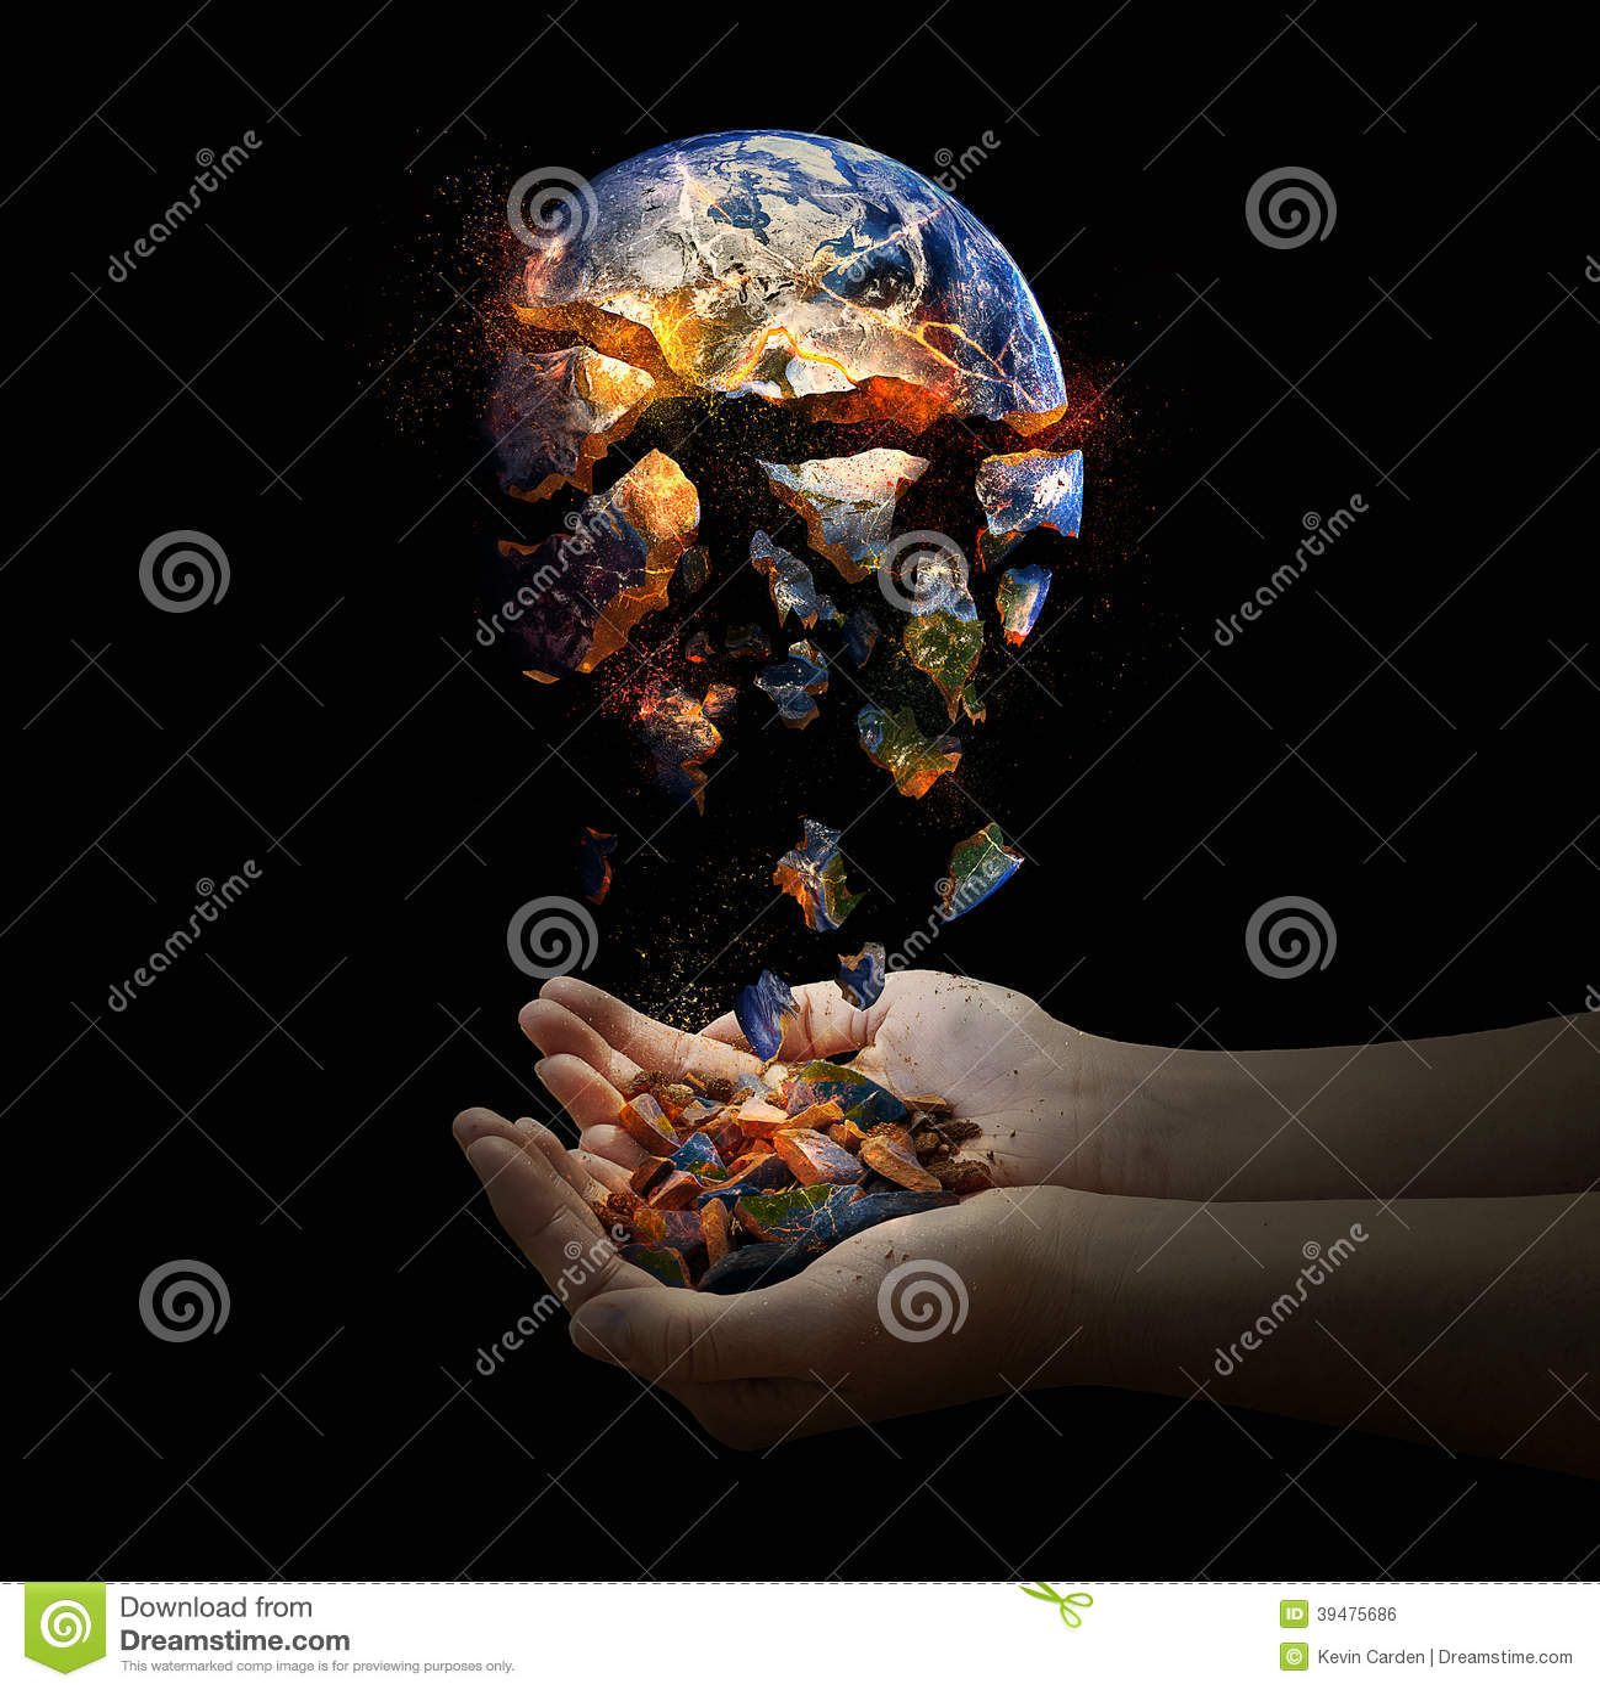 Falling apart world. stock photo. Image of planet, fall ...